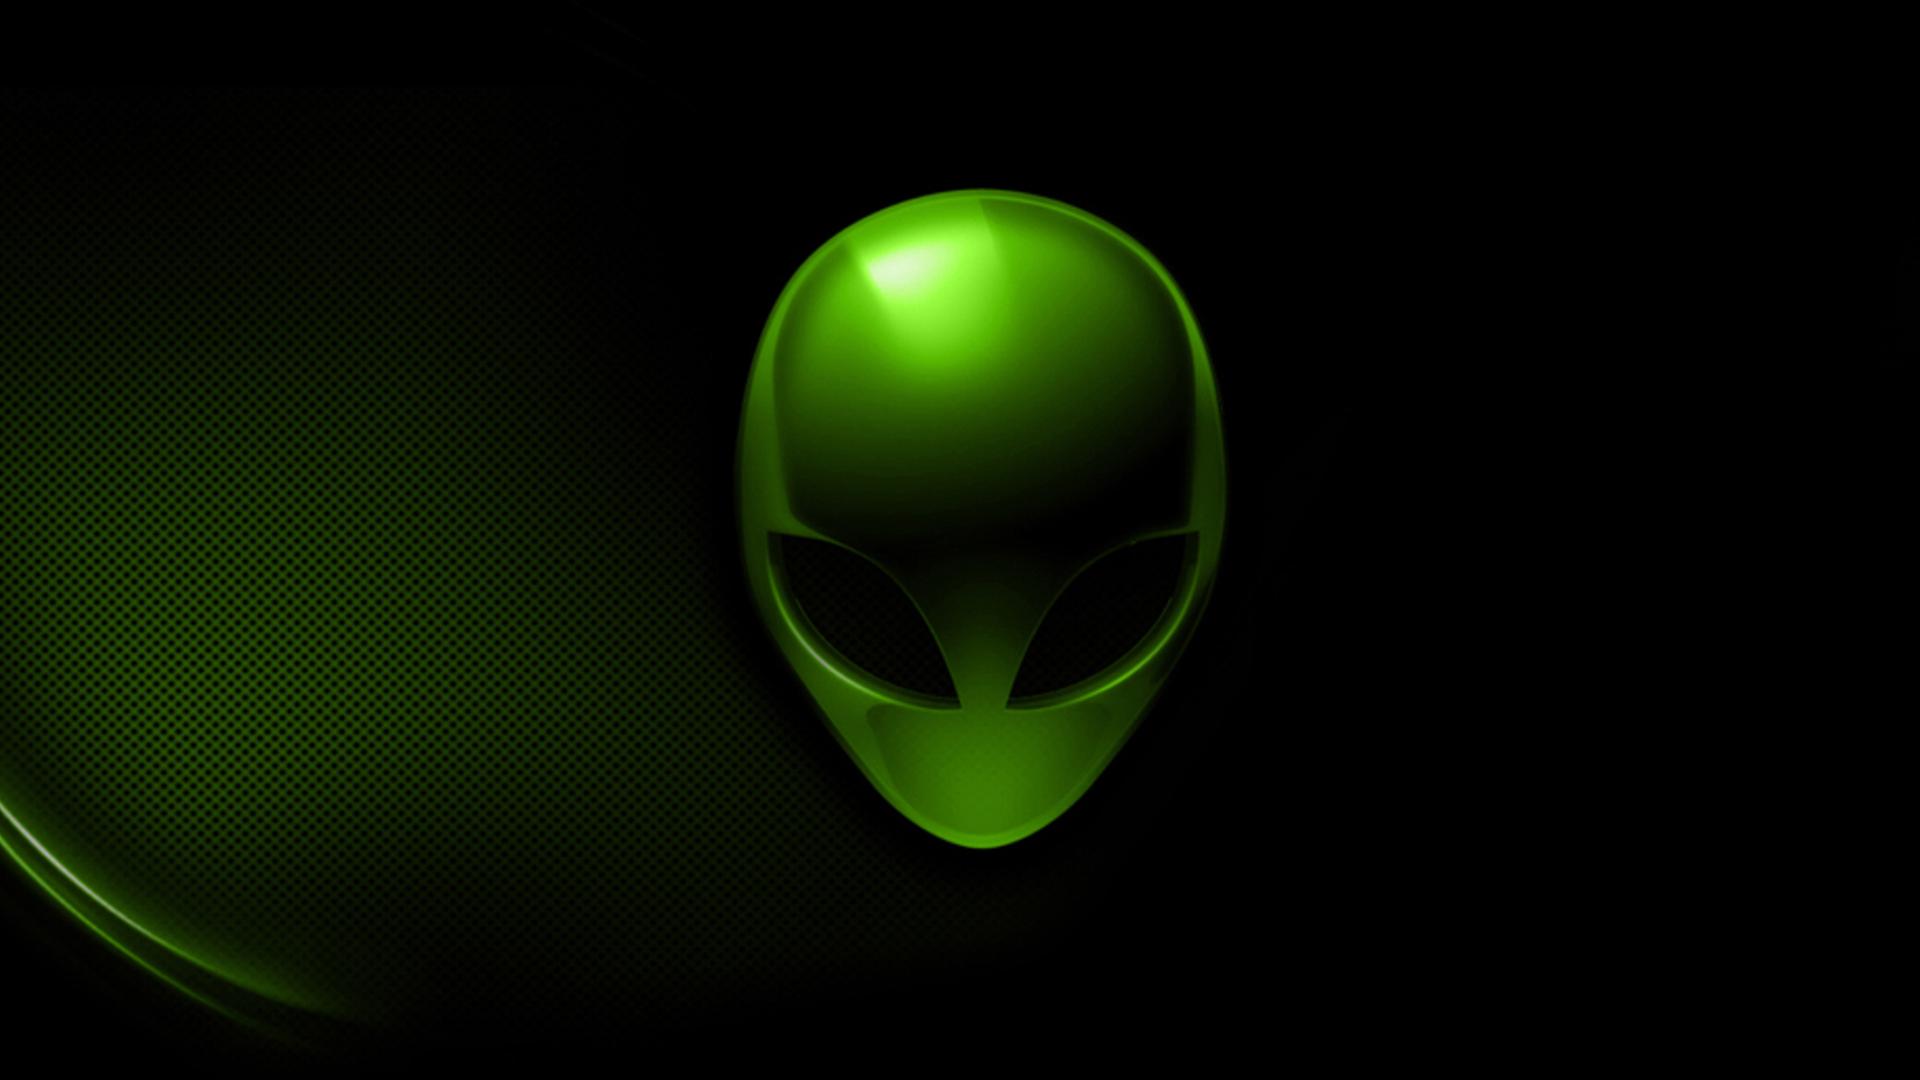 Wallpaper 1920x1080 Dark >> Alienware Green Wallpaper - WallpaperSafari